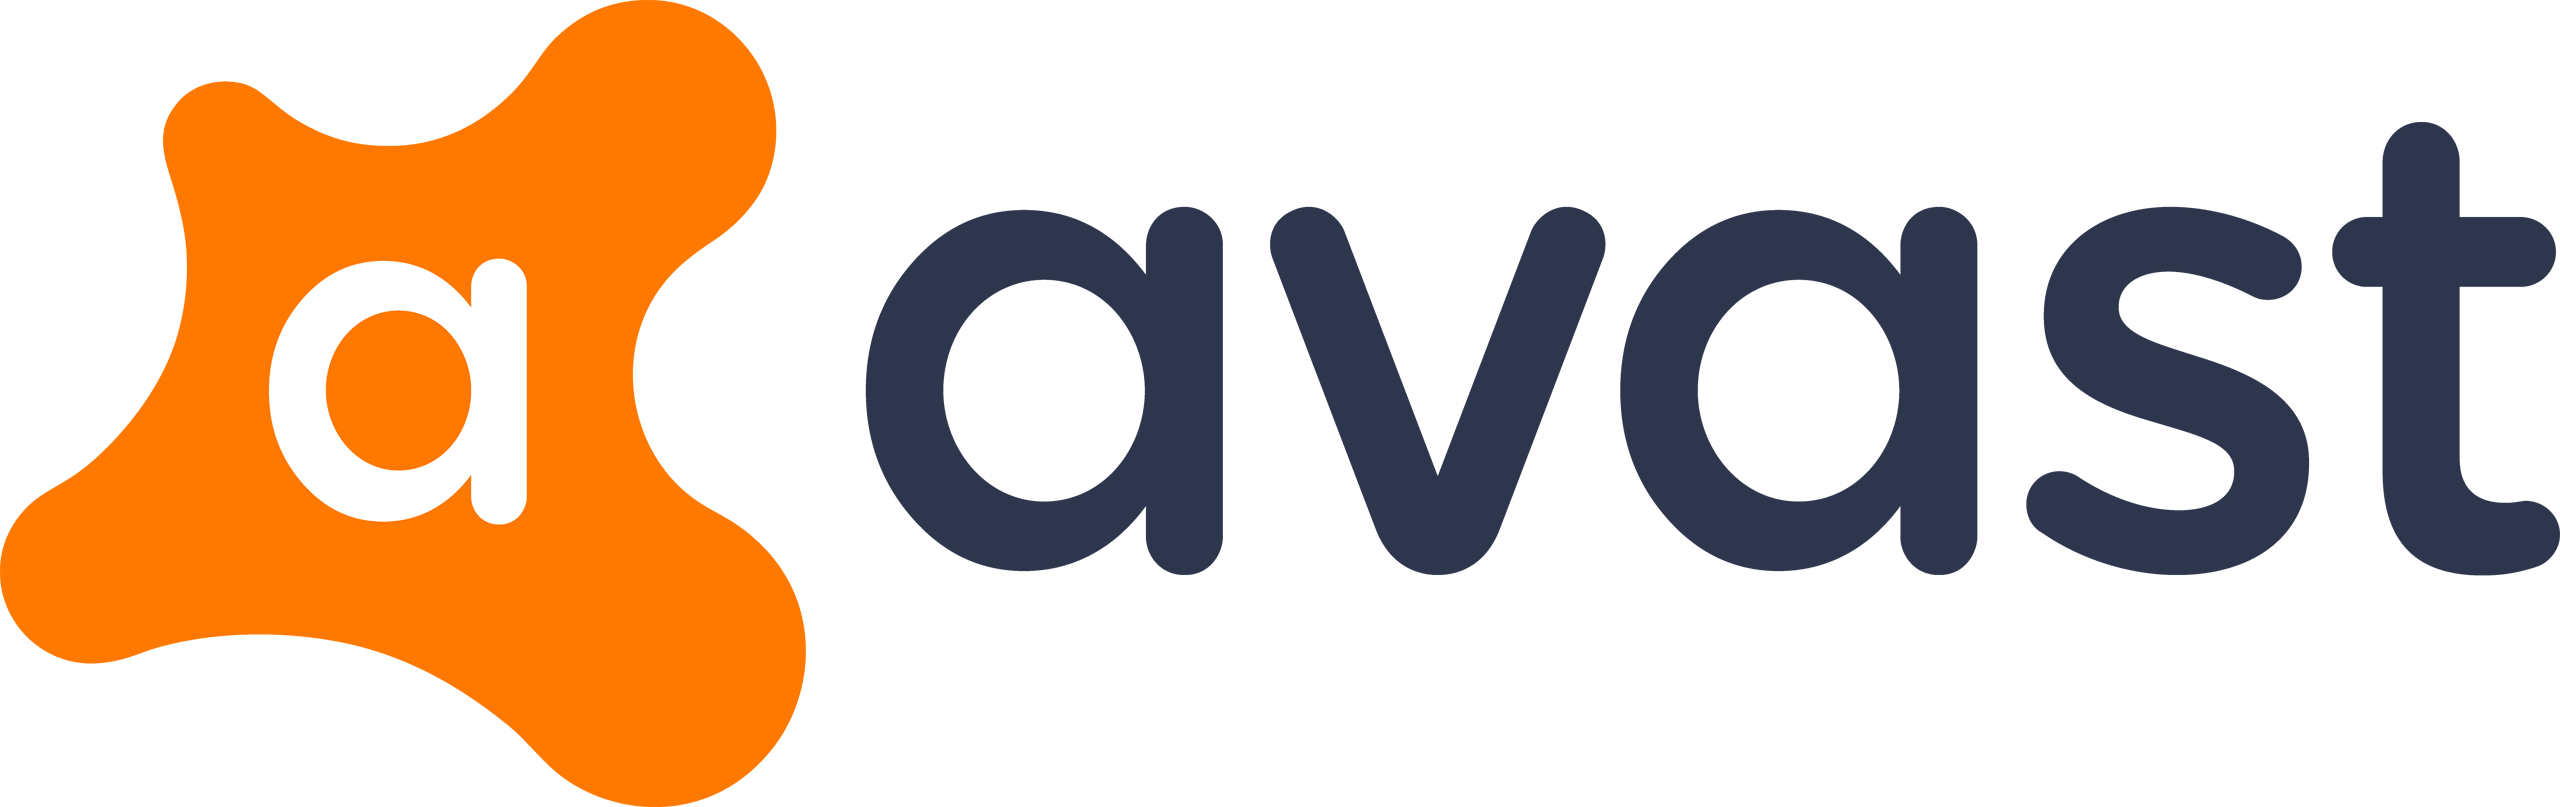 assets/static/images/membership/logos/Avast.png